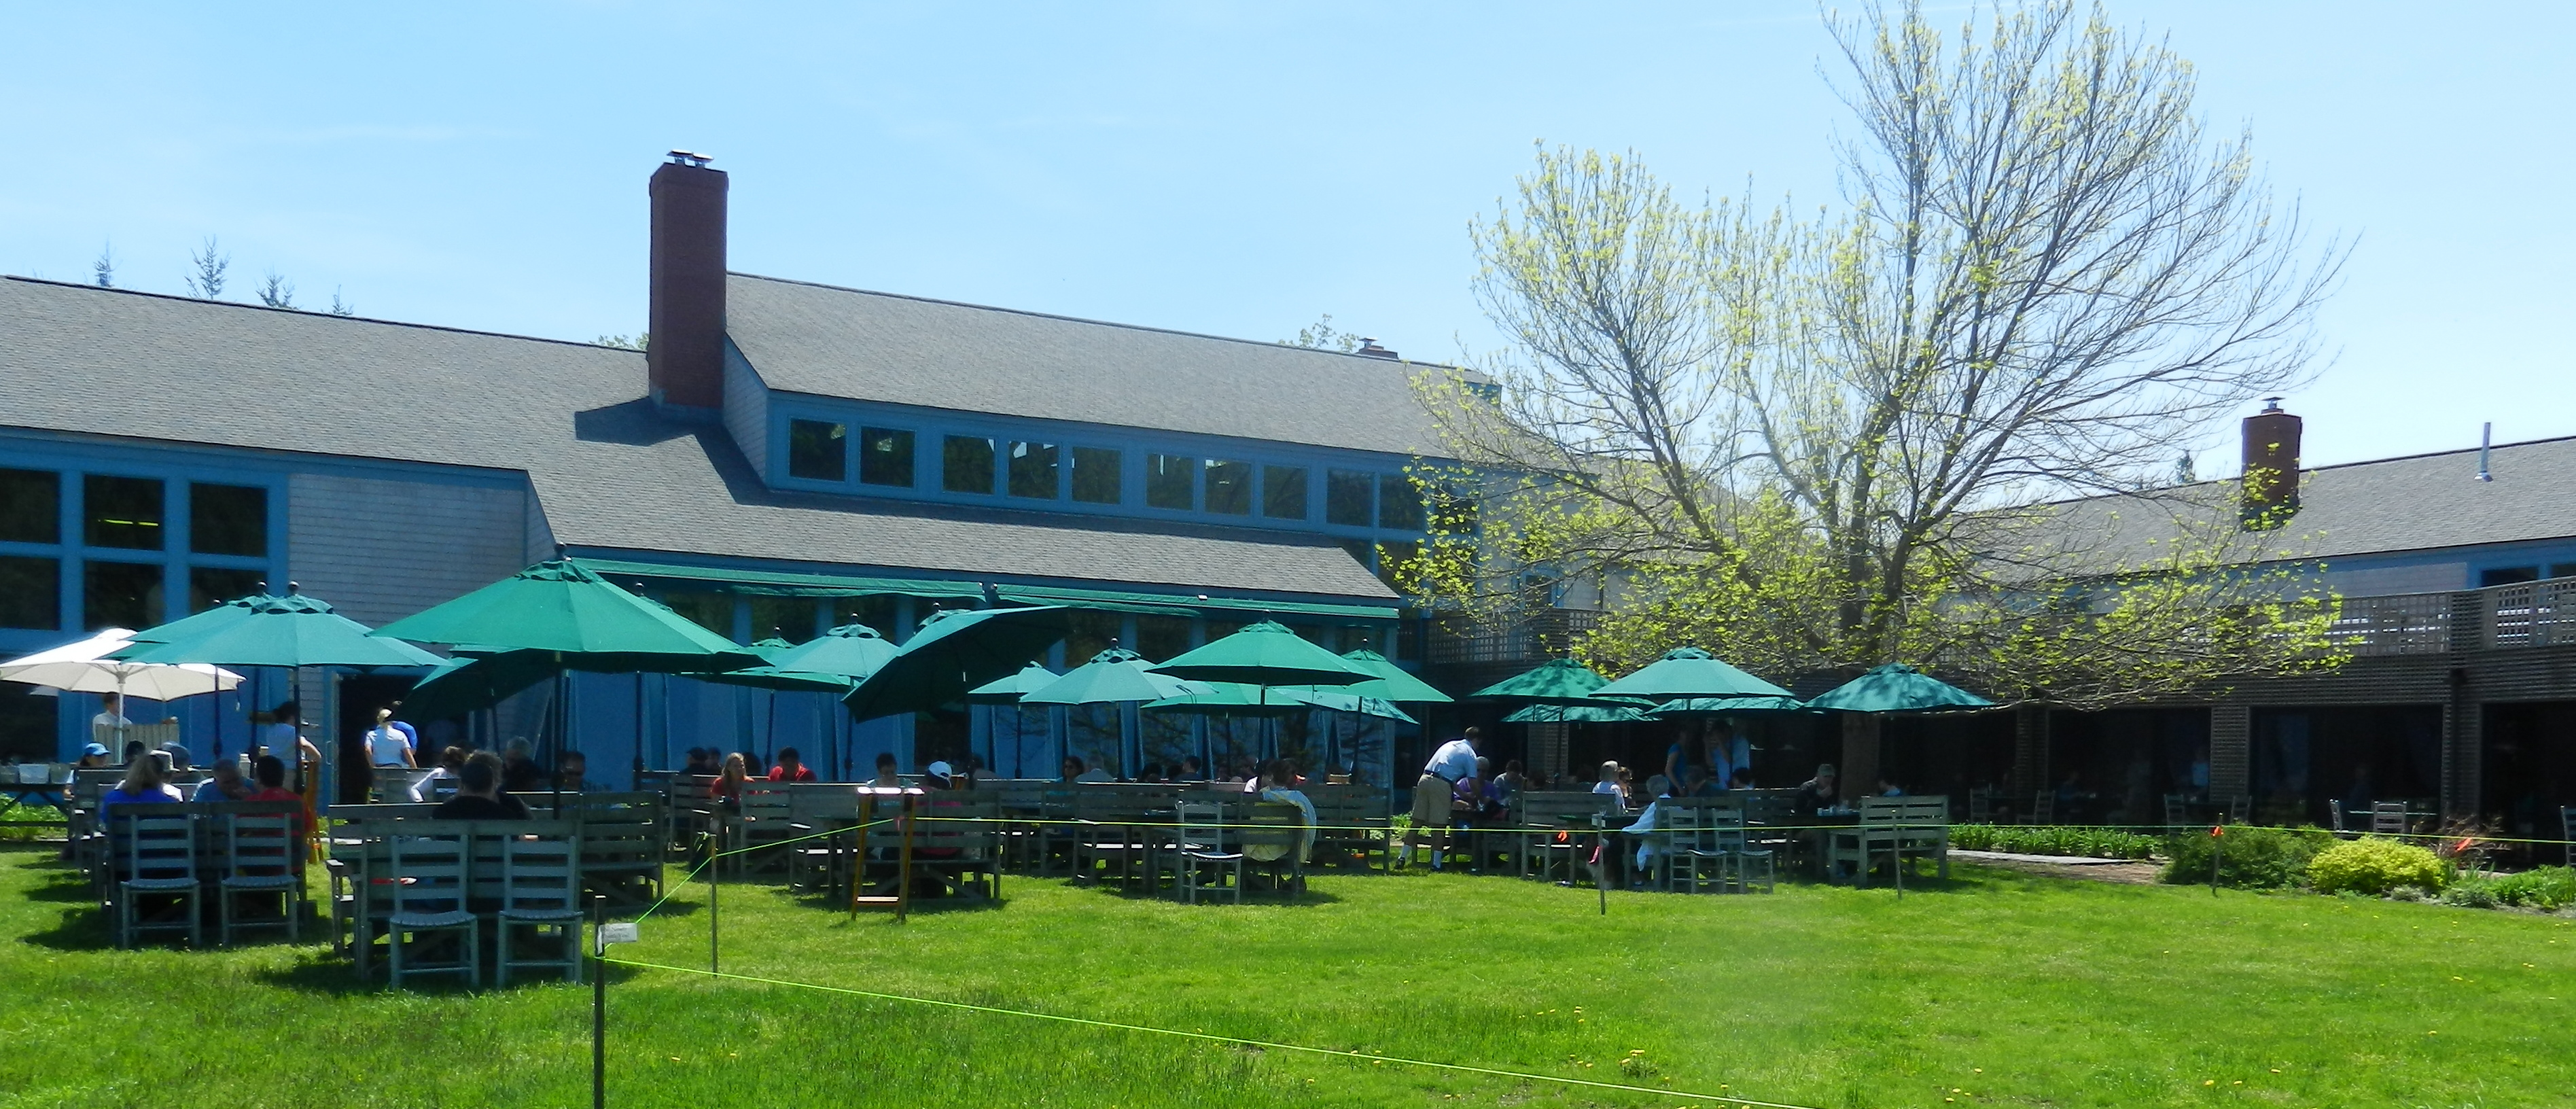 Bar Harbor, Maine – Lobster and Blueberries | Julia, Julie & I - The ...